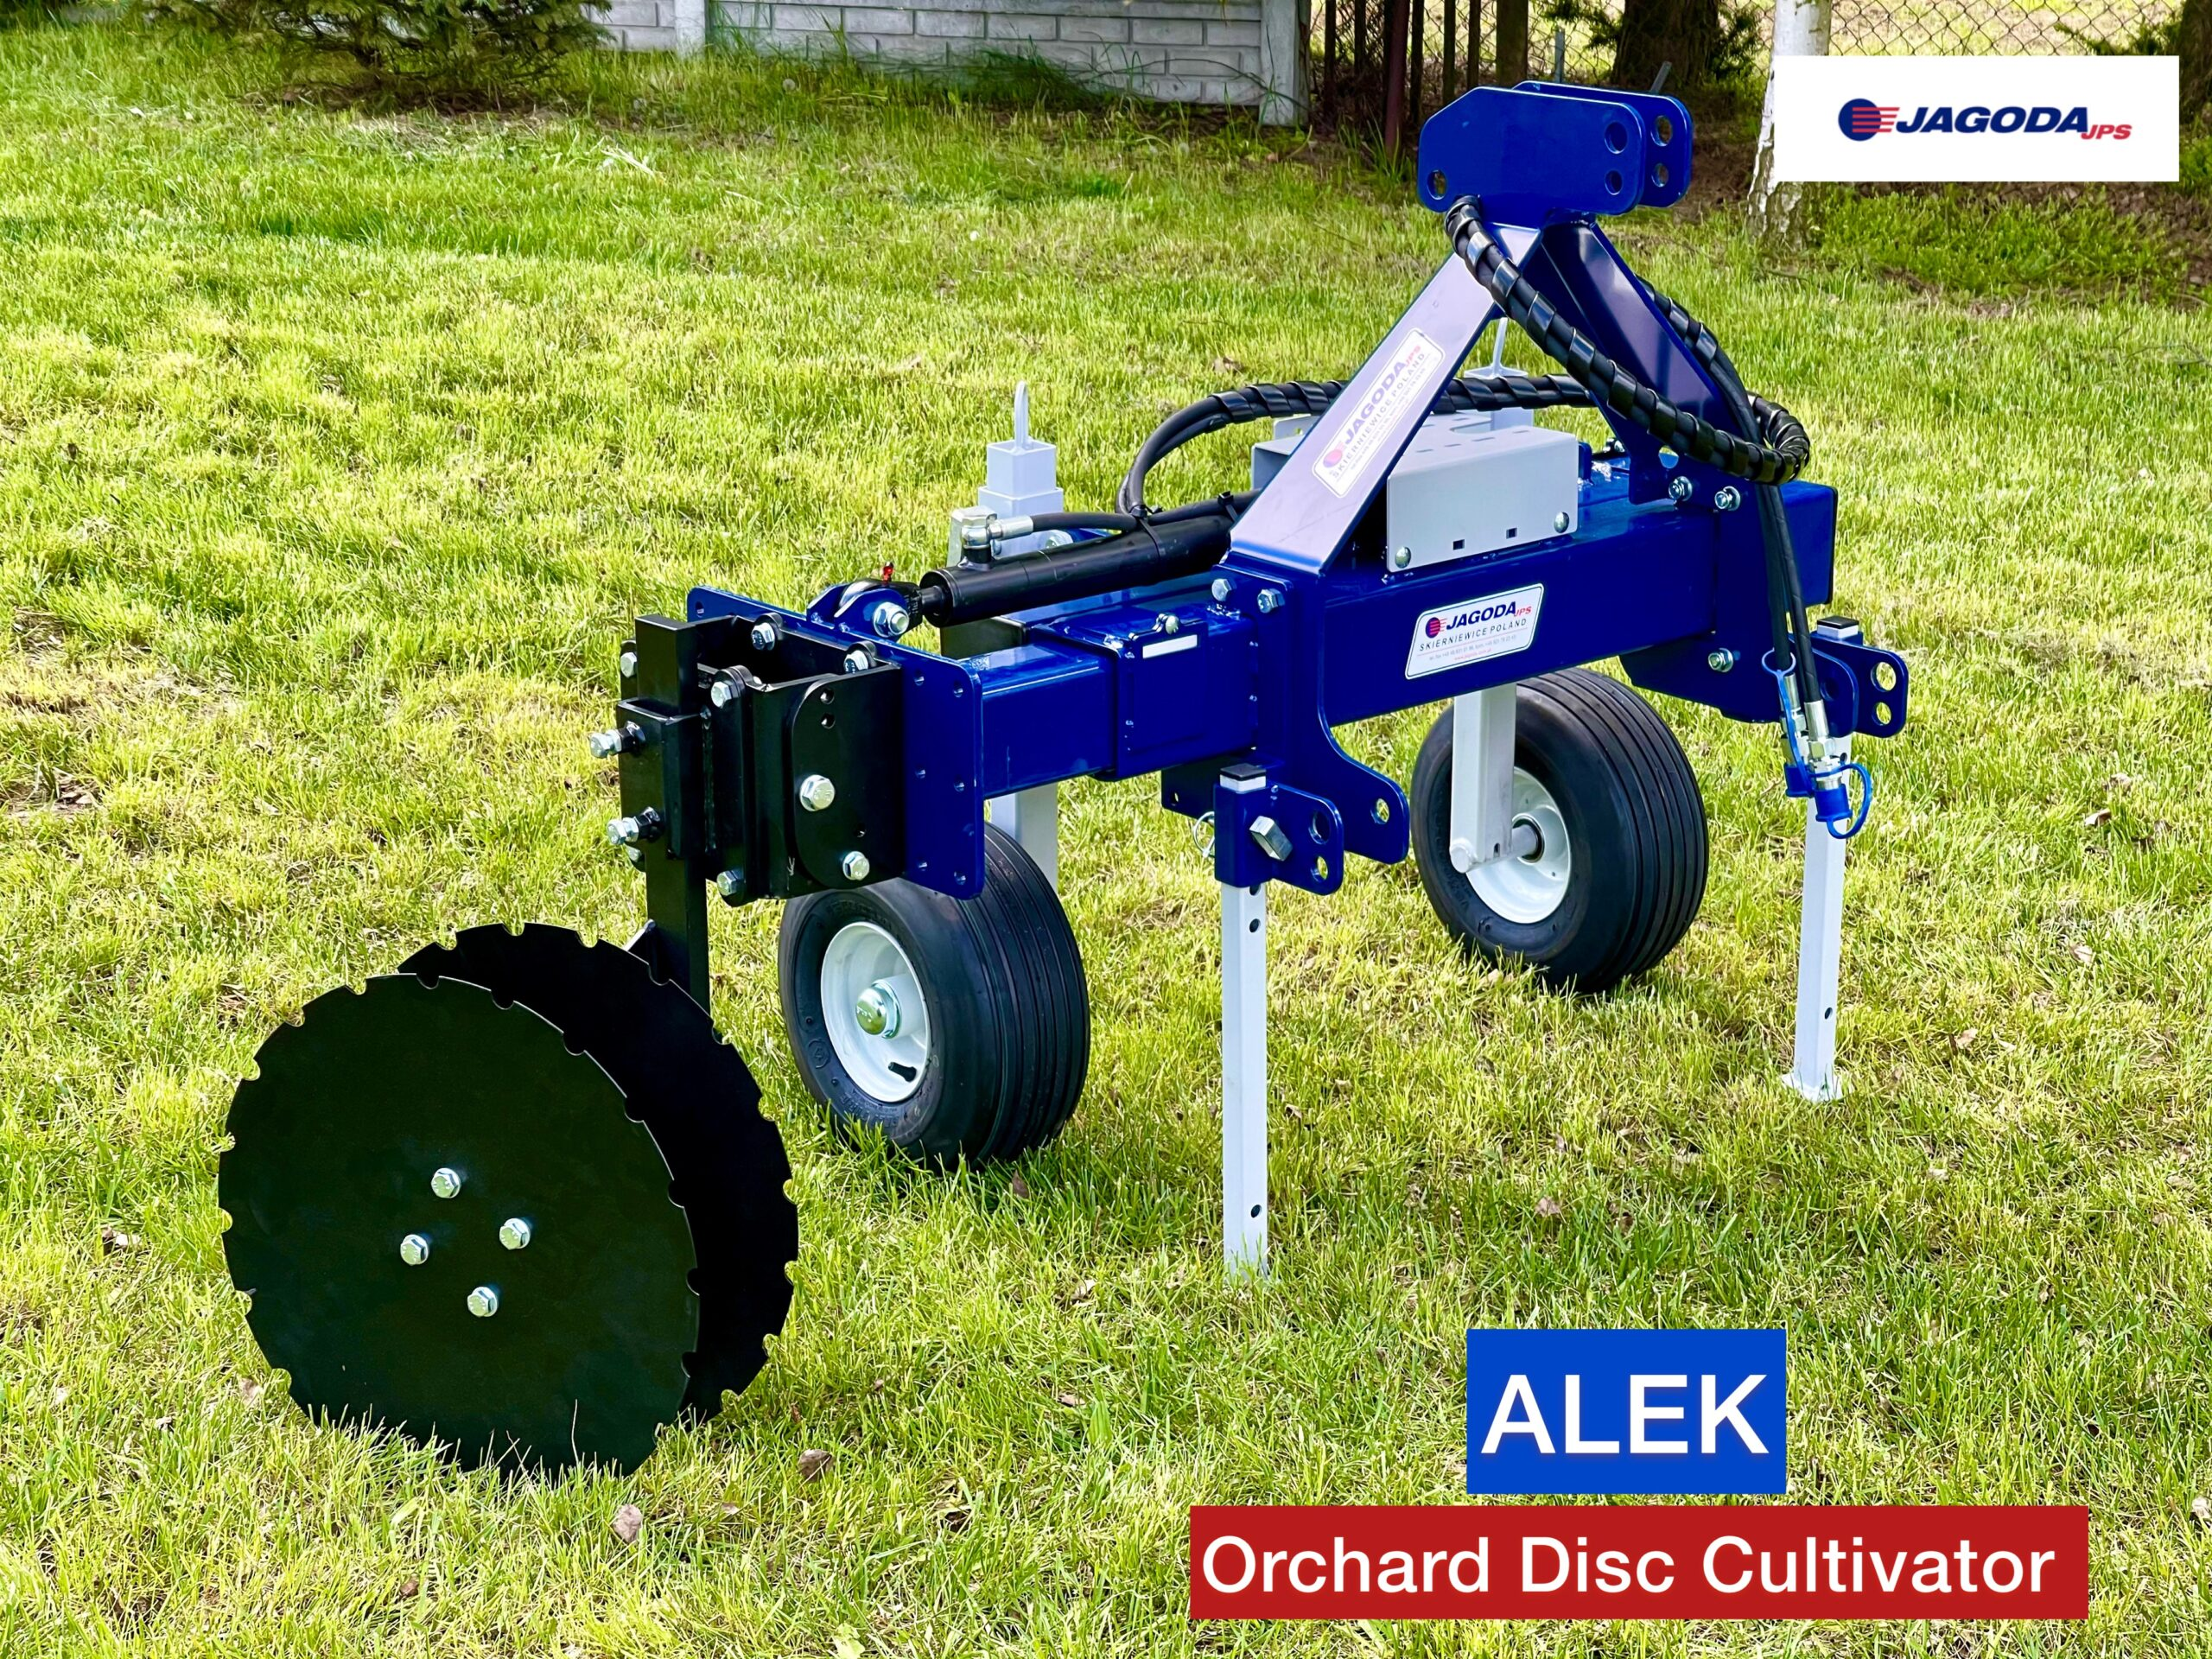 Orchard Disc Cultivator ALEK